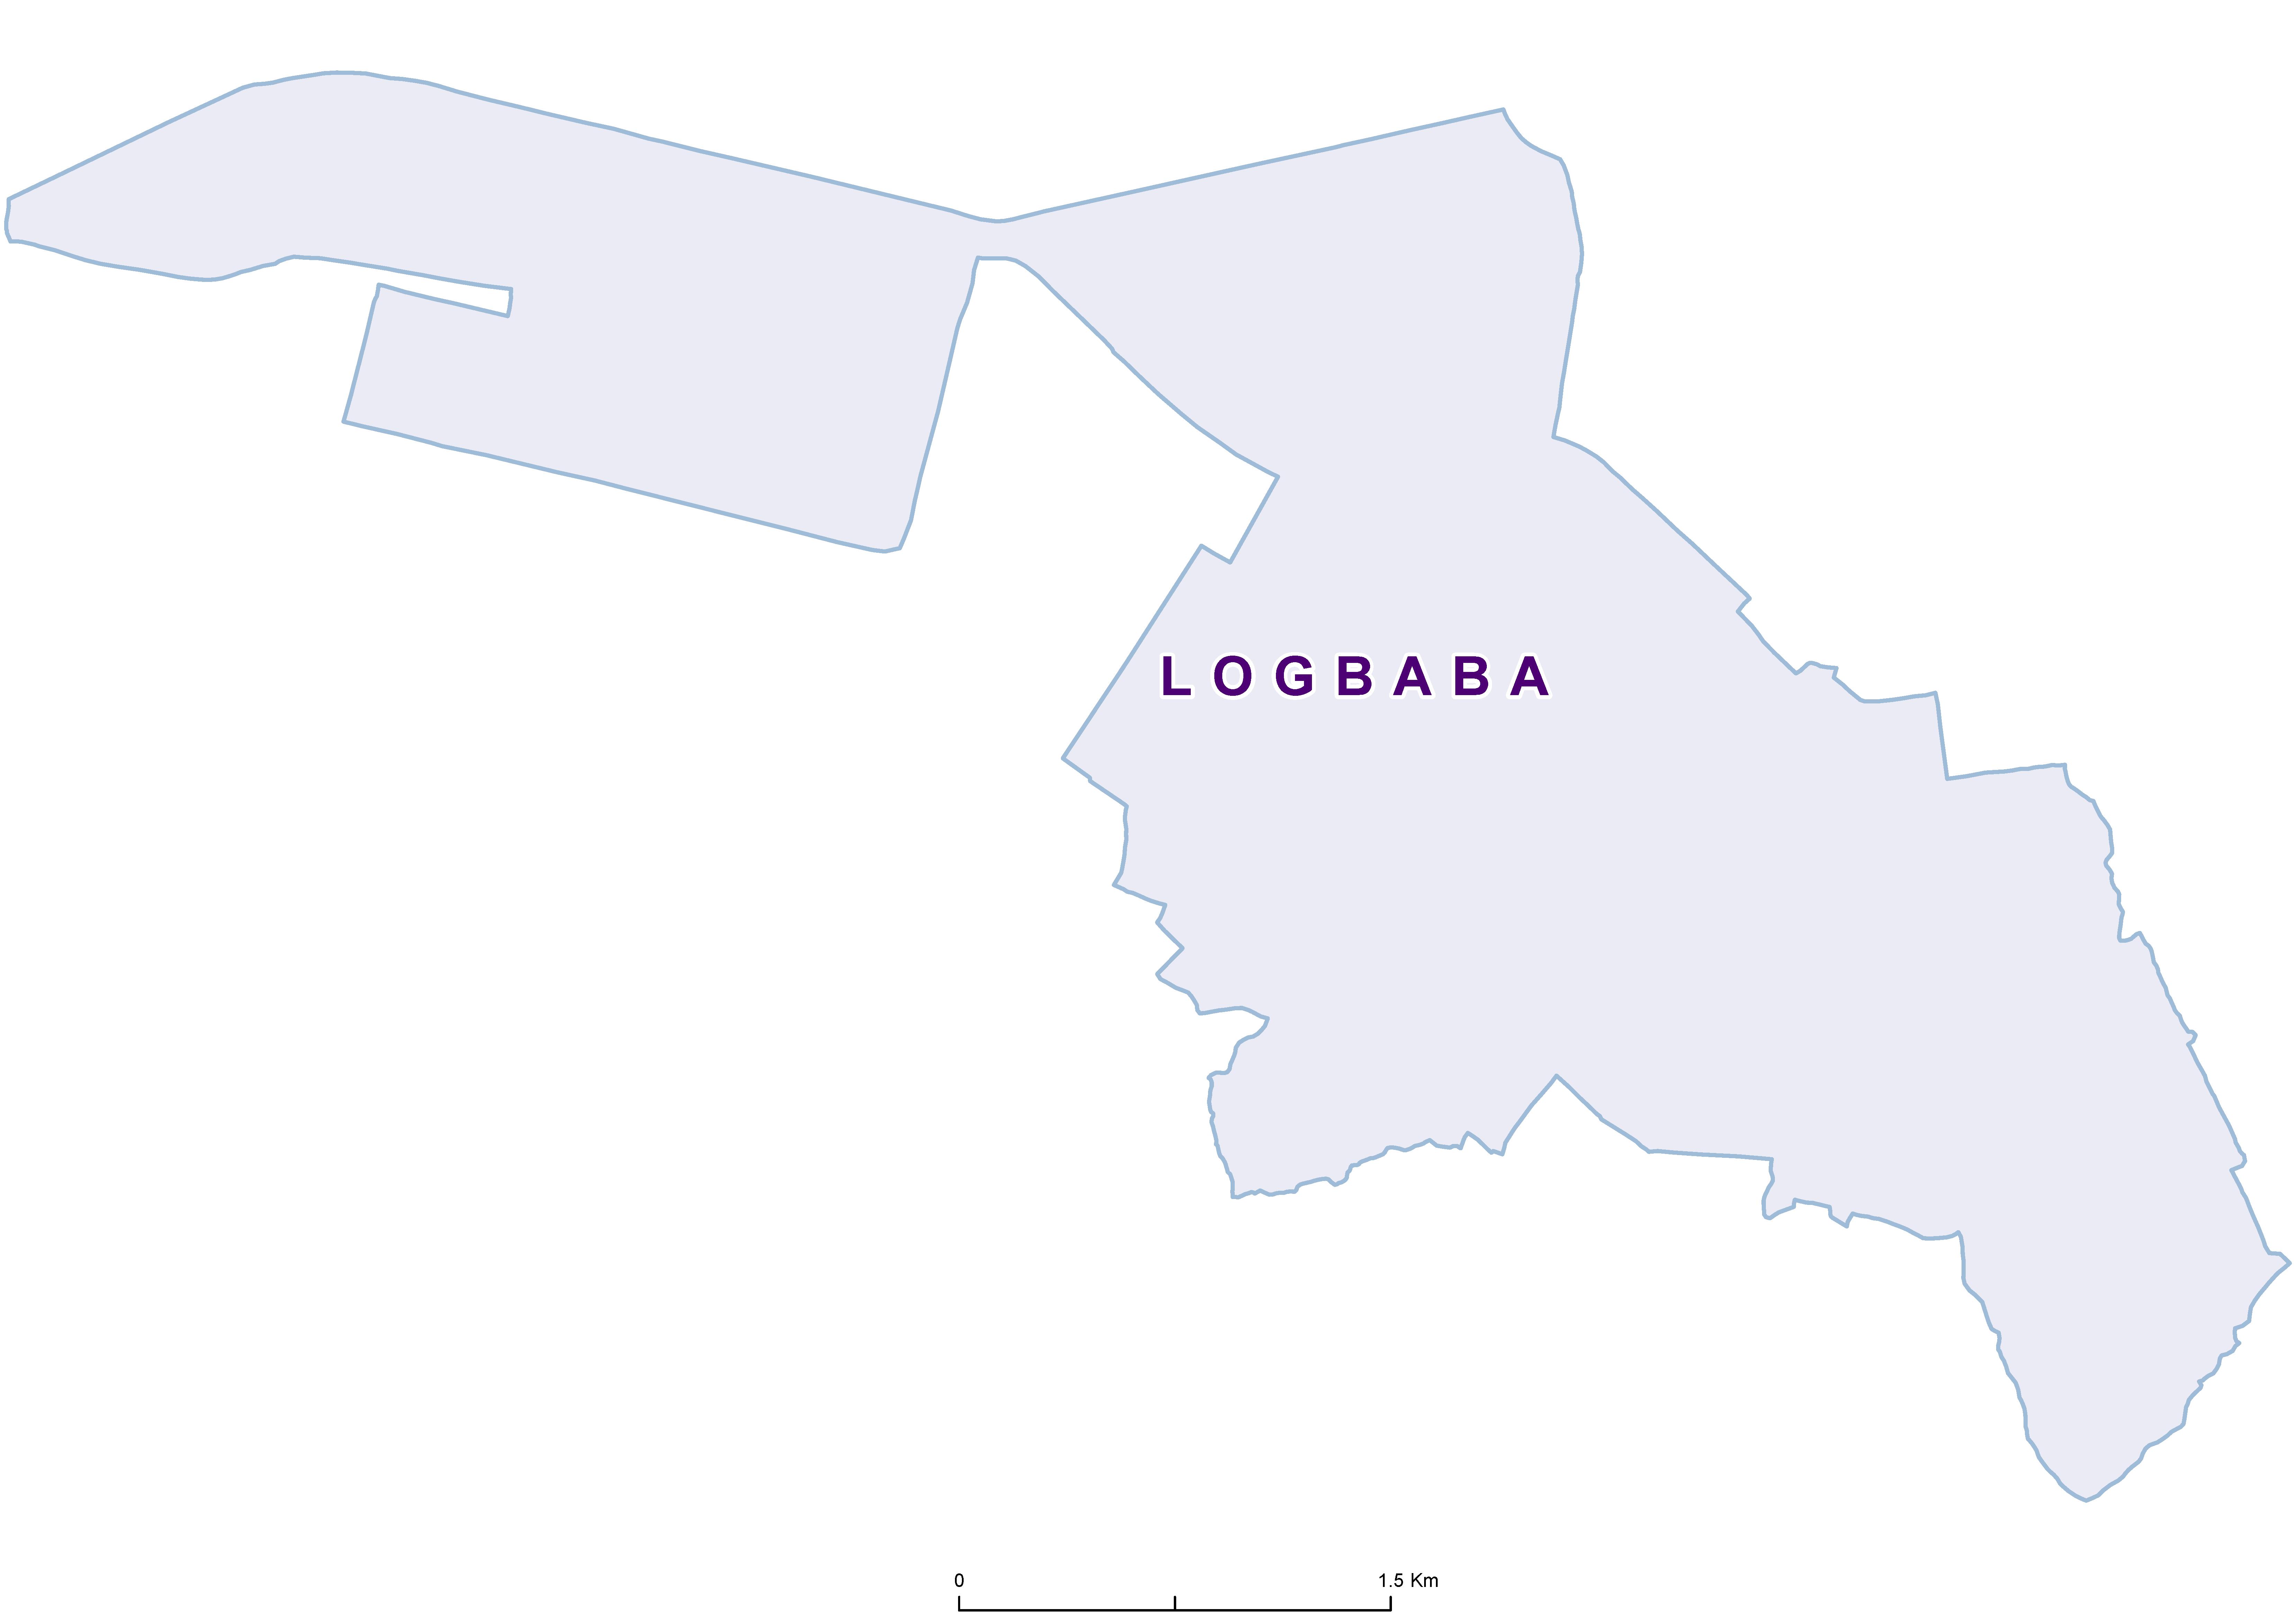 Logbaba Max STH 20180001